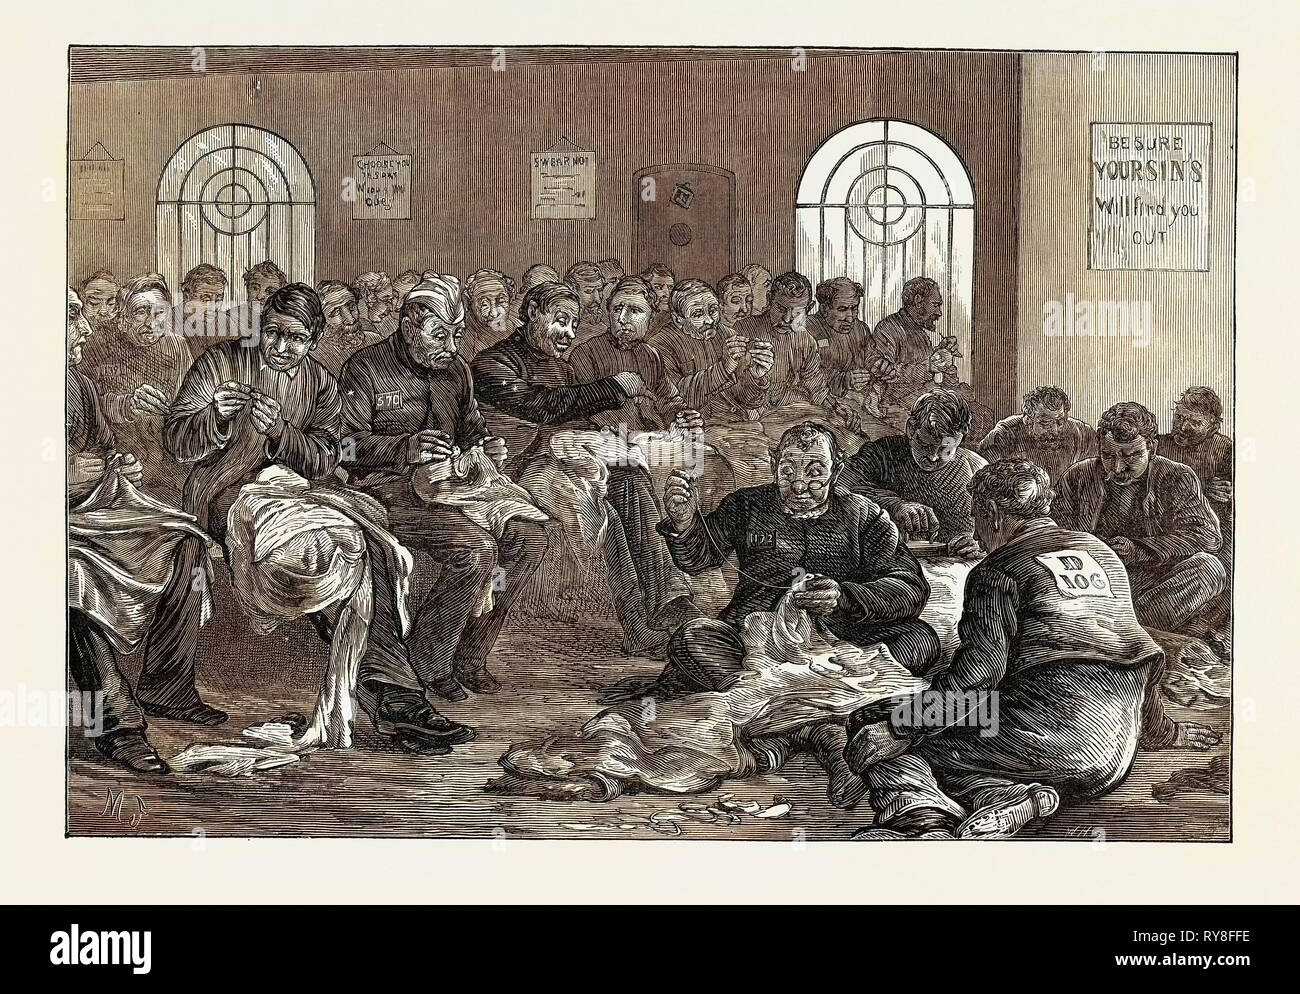 The Clerkenwell House of Correction: The Needle Room 1874 - Stock Image